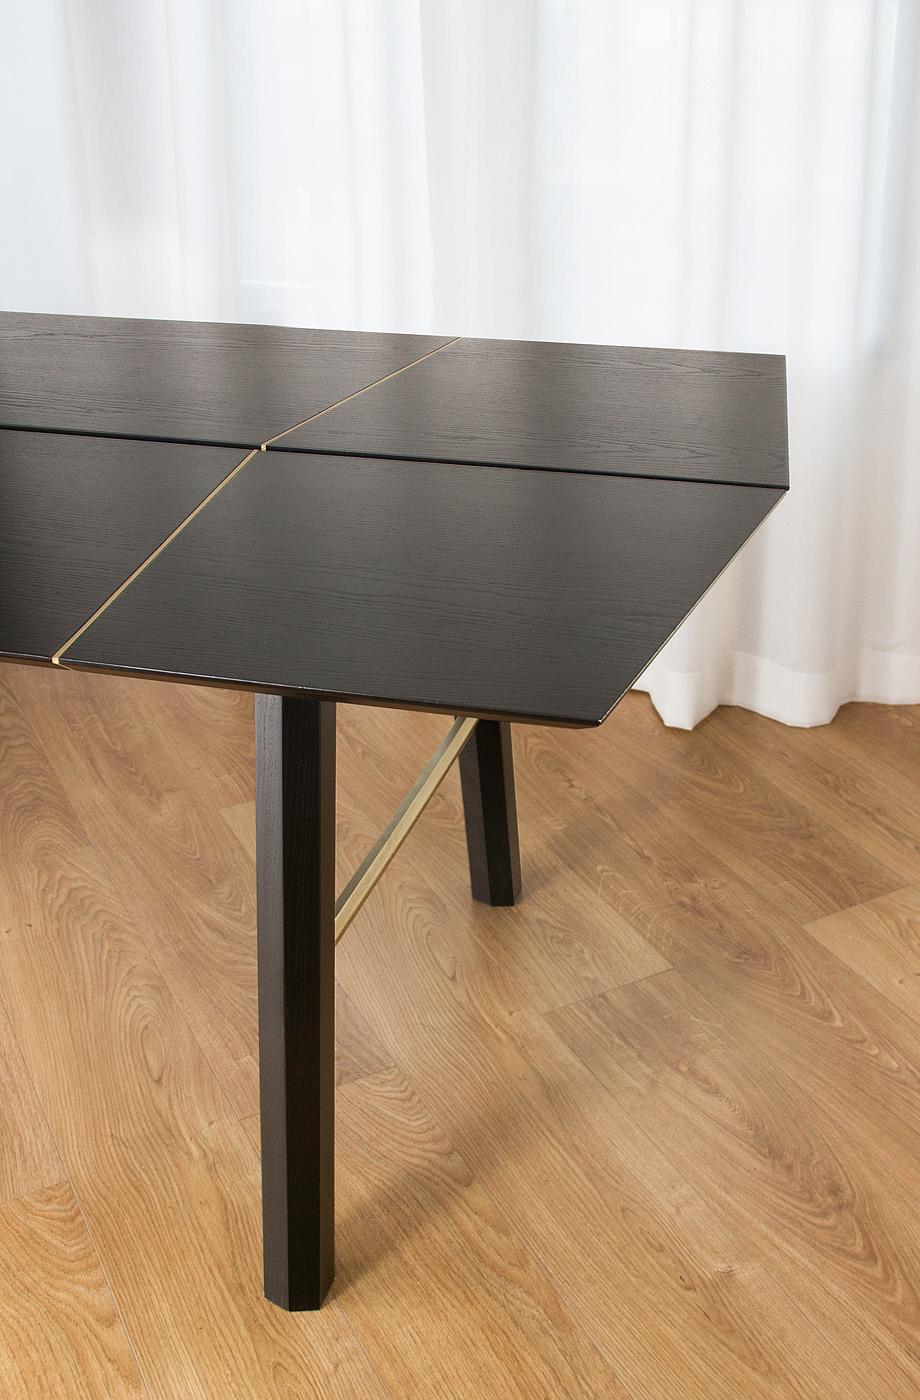 mesa savia de daniel garcia para woodendot (9)